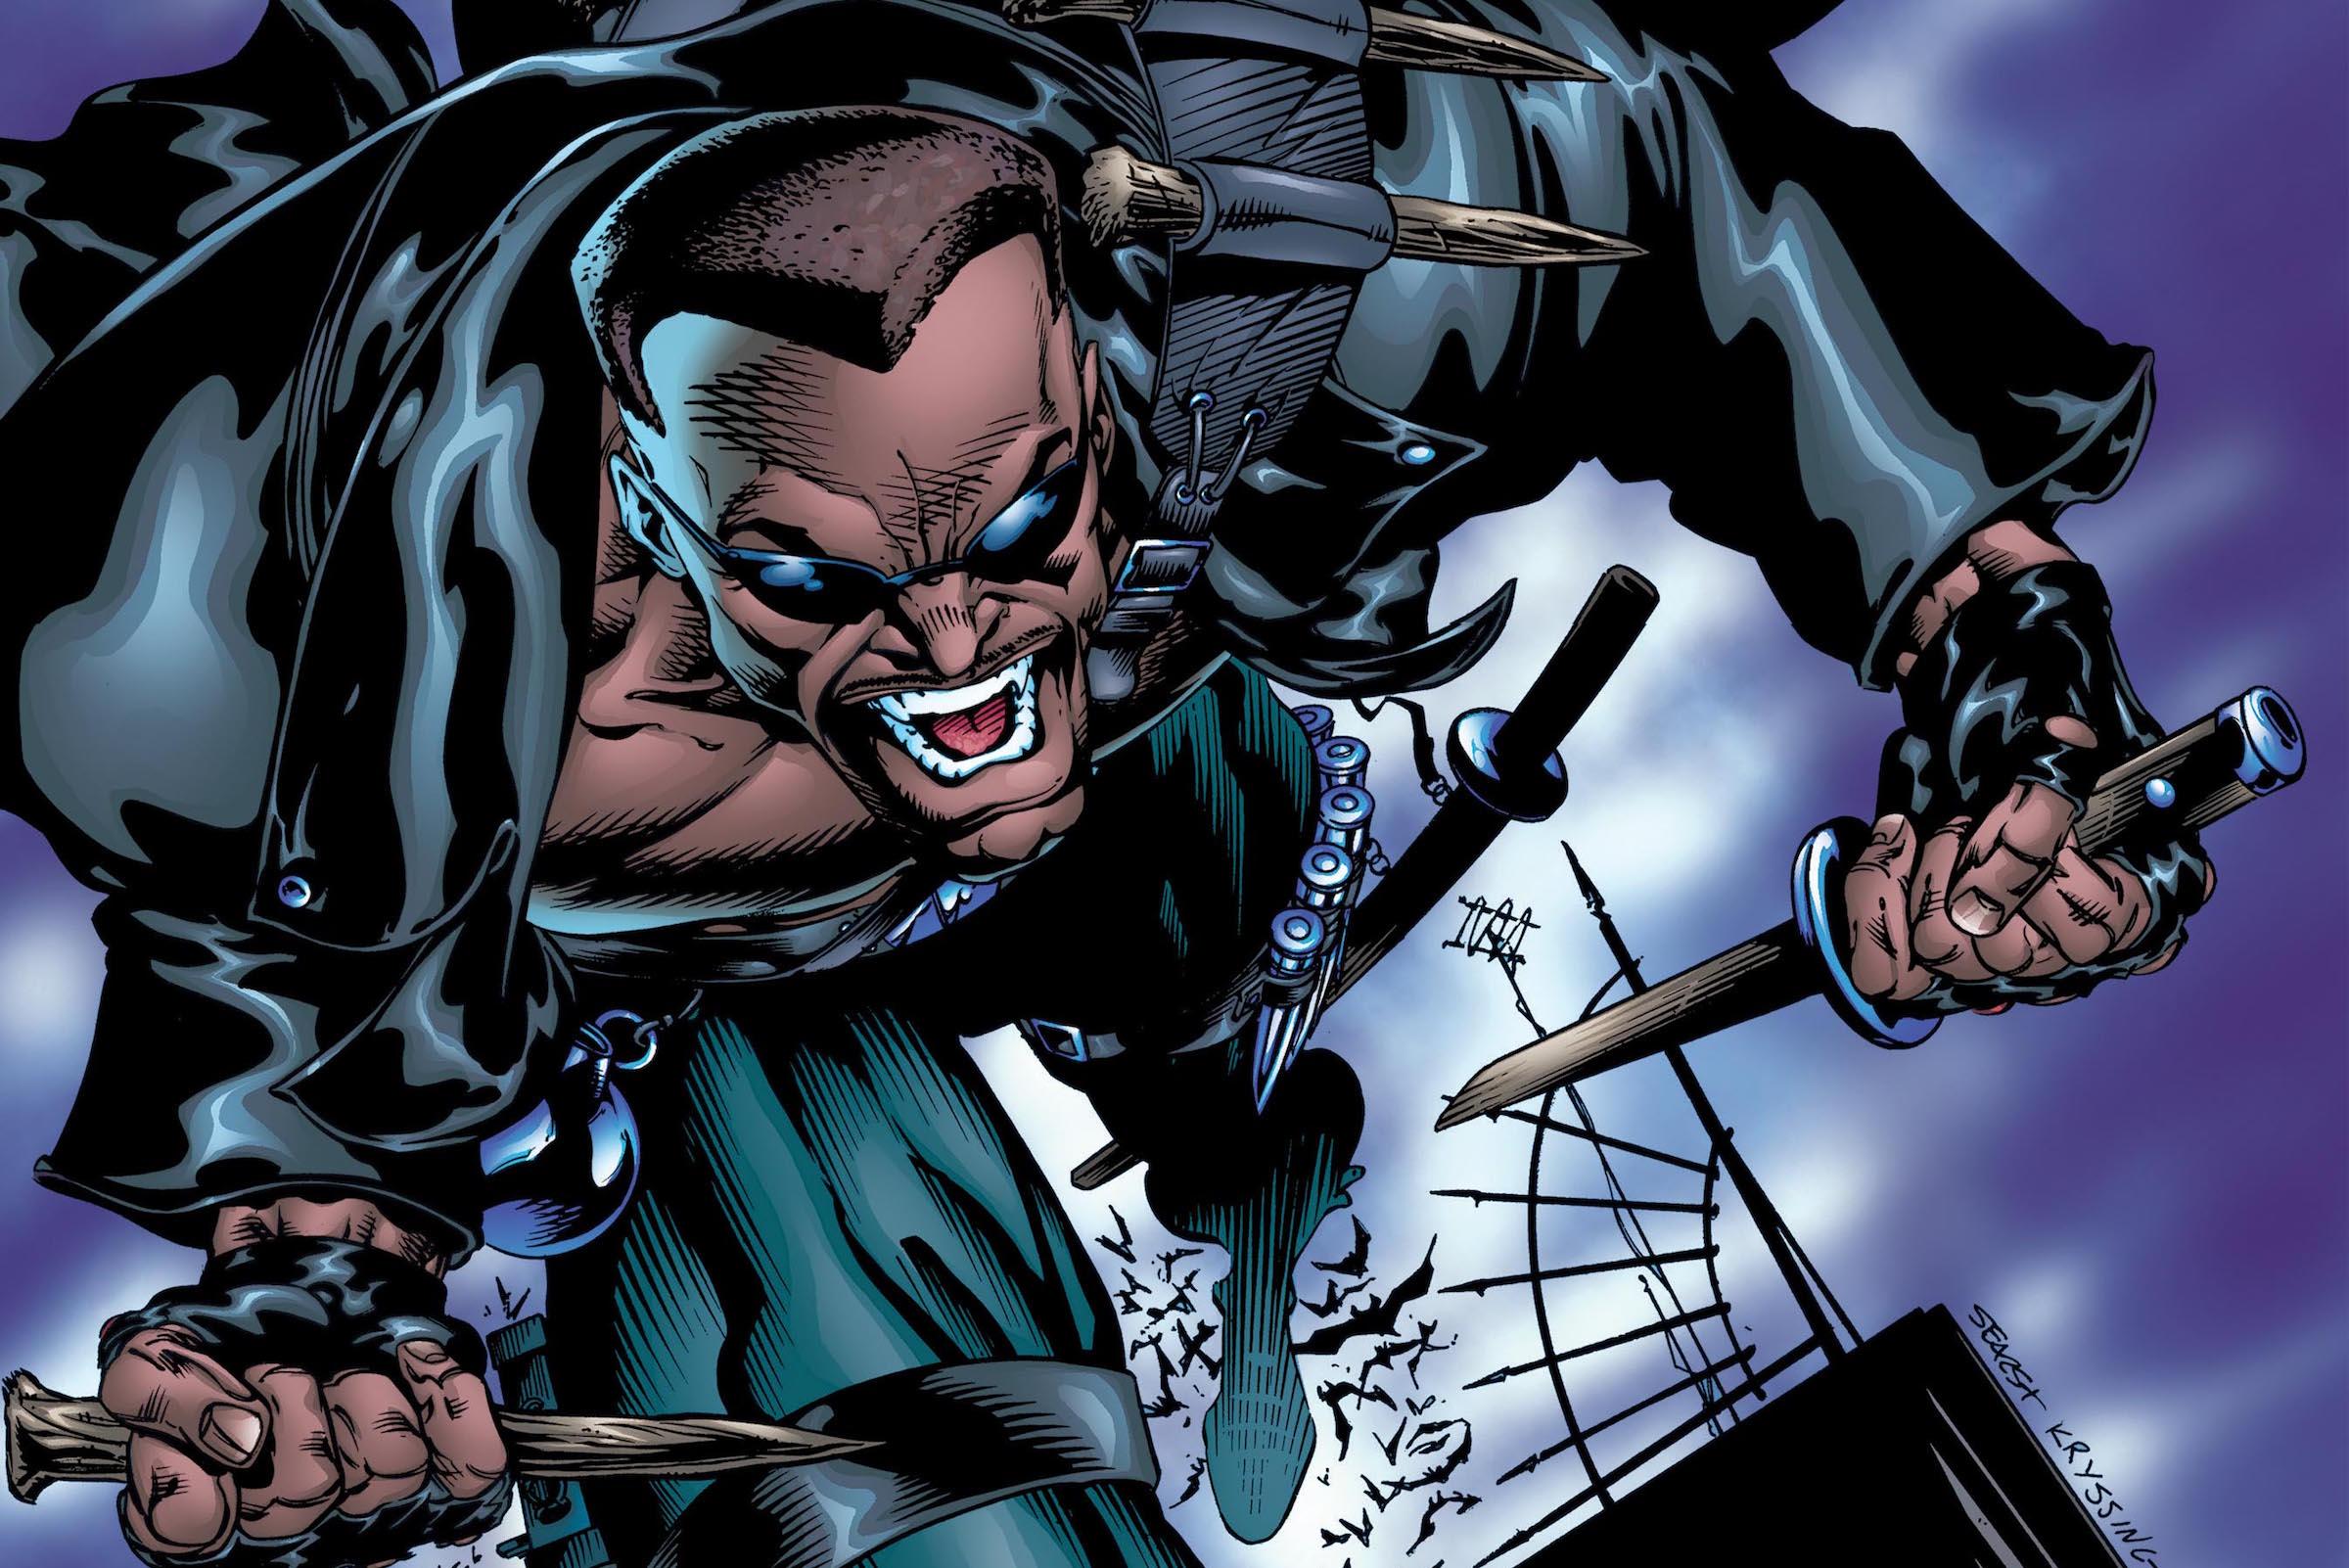 Marvel announces new Blade movie starring Mahershala Ali at Comic-Con